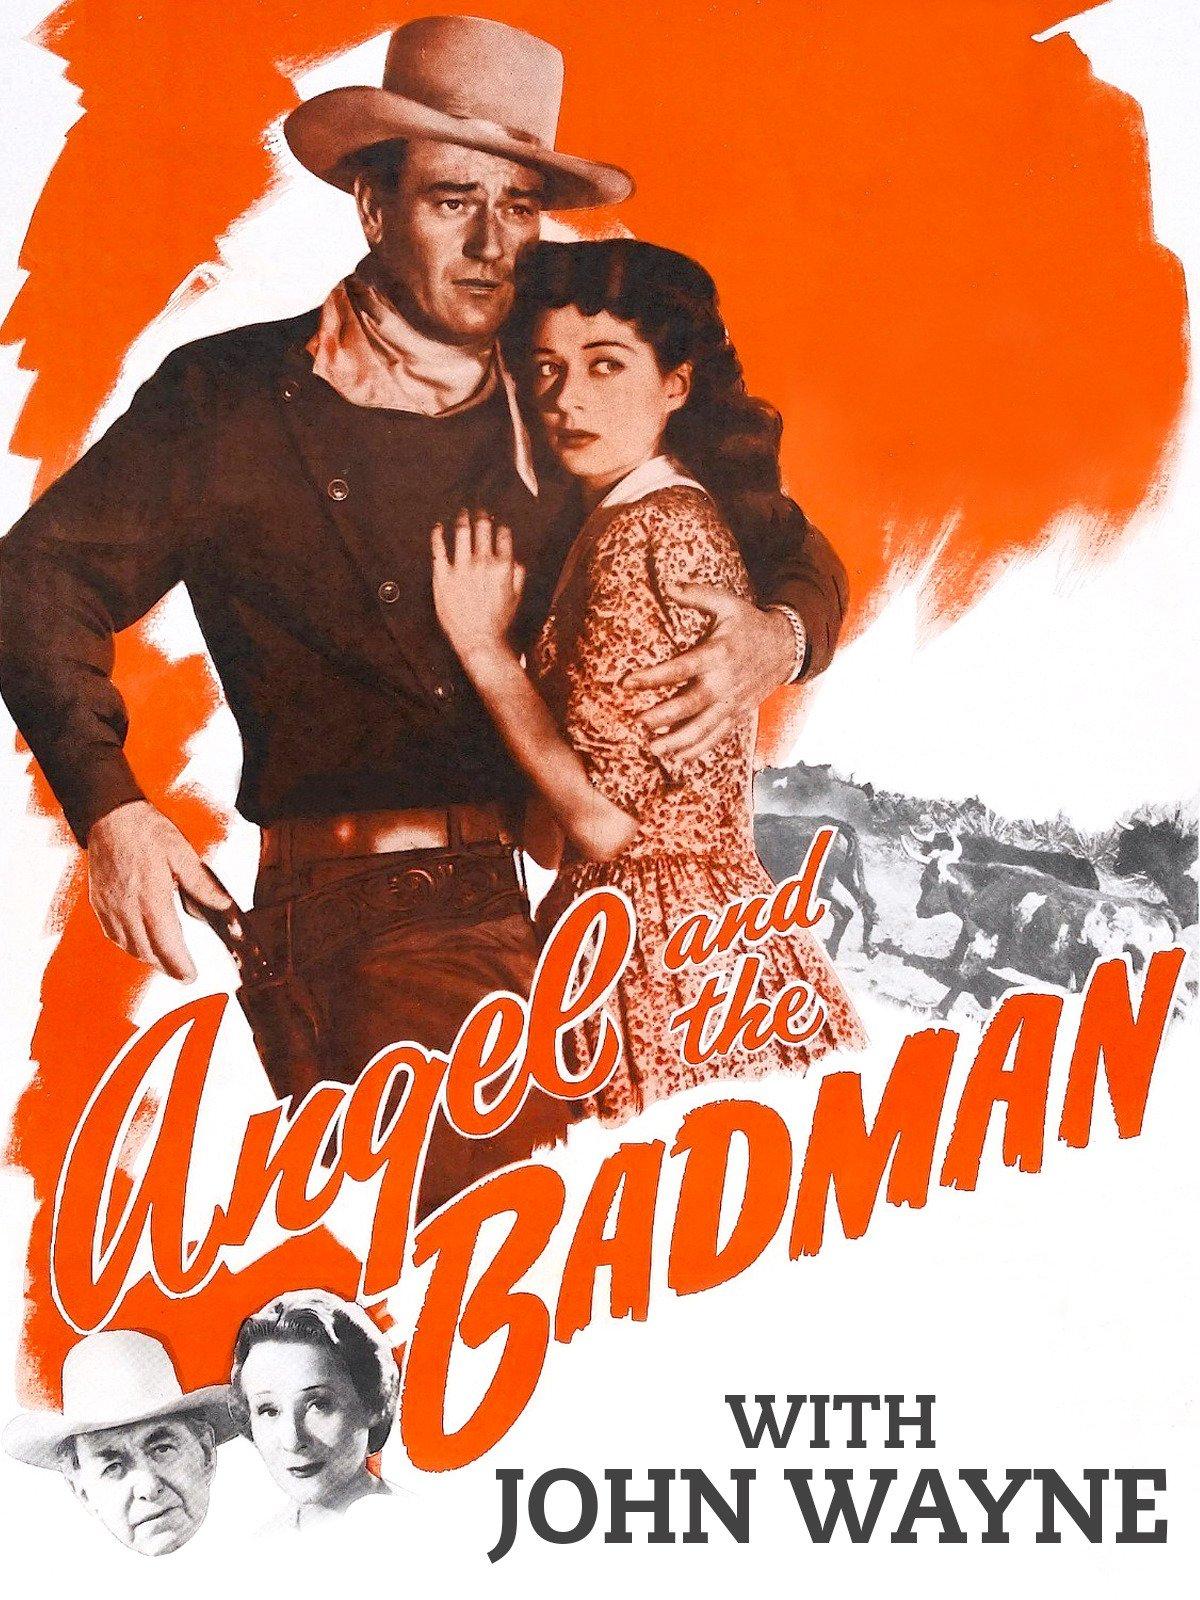 Angel and the Badman with John Wayne